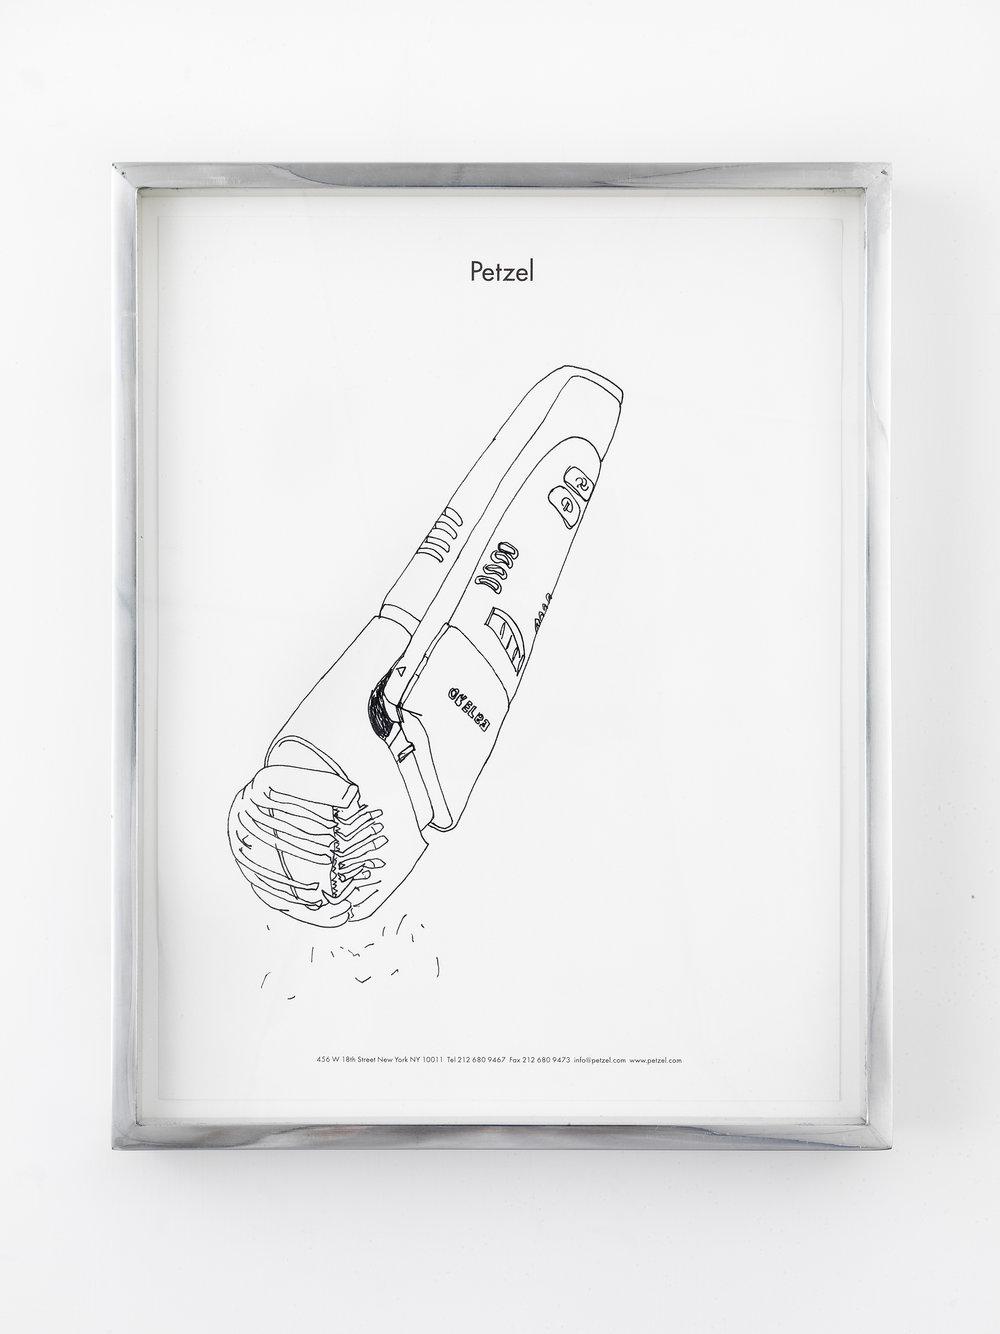 Philips Norelco TR980 Turbo Vacuum Trimmer (broken), Great Arthur House, #44, Fann Street, Golden Lane Estate, London, EC1, September 16, 2014   2014  Ink on paper  10 x 12 1/2 inches